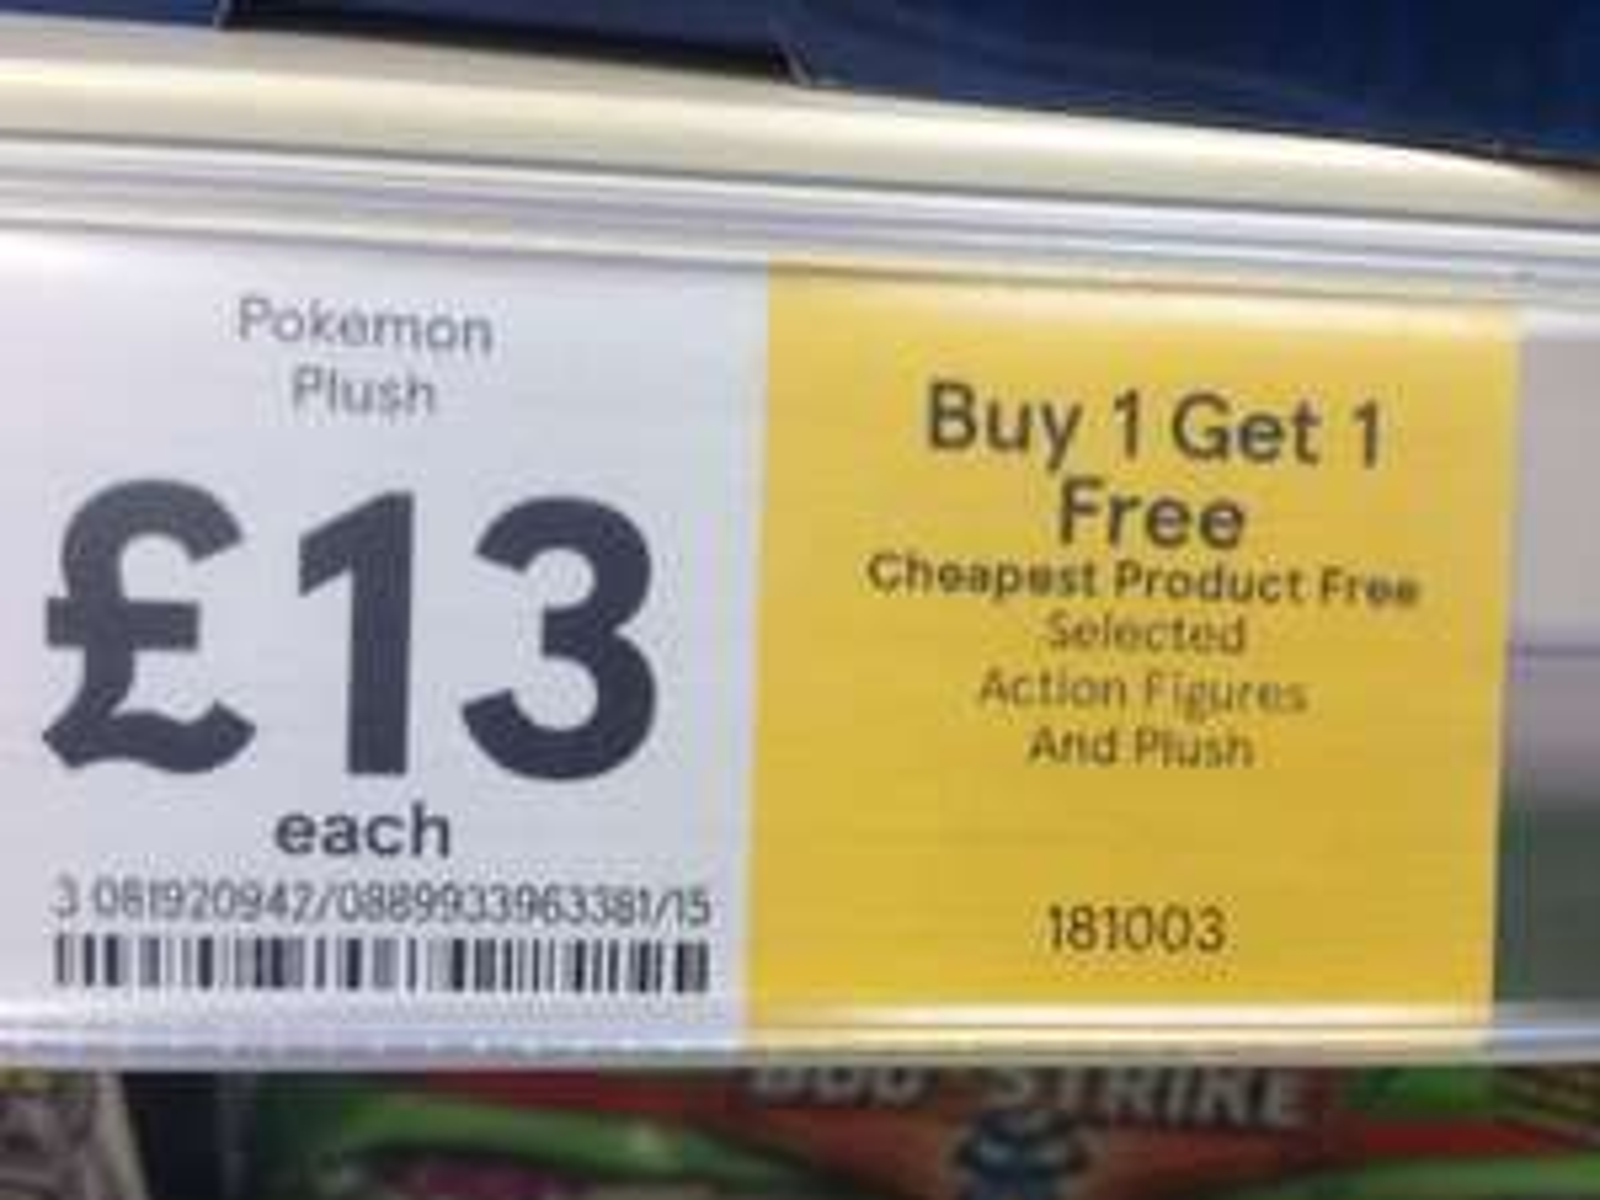 8 Inch Pokemon Plushies - £13 Buy One Get One Free @ Tesco